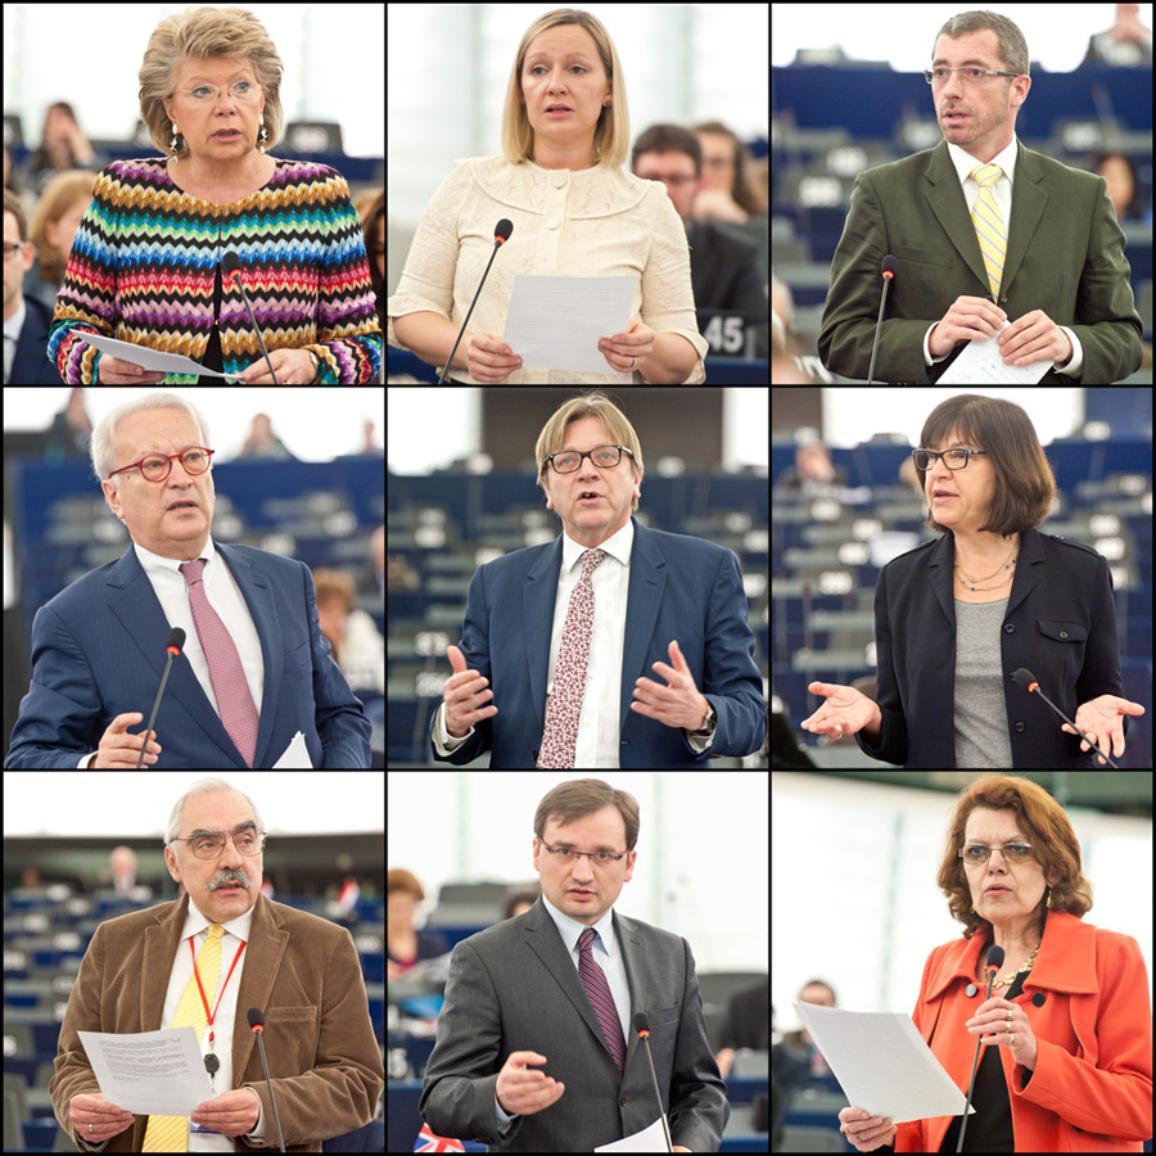 From left to right, top to bottom:  Viviane Reding, Lucinda Creighton, Frank Engel, Hannes Swoboda, Guy Verhofstadt, Rebecca Harms, Lajos Bokros, Zbigniew Ziobro and Marie-Christine Vergiat